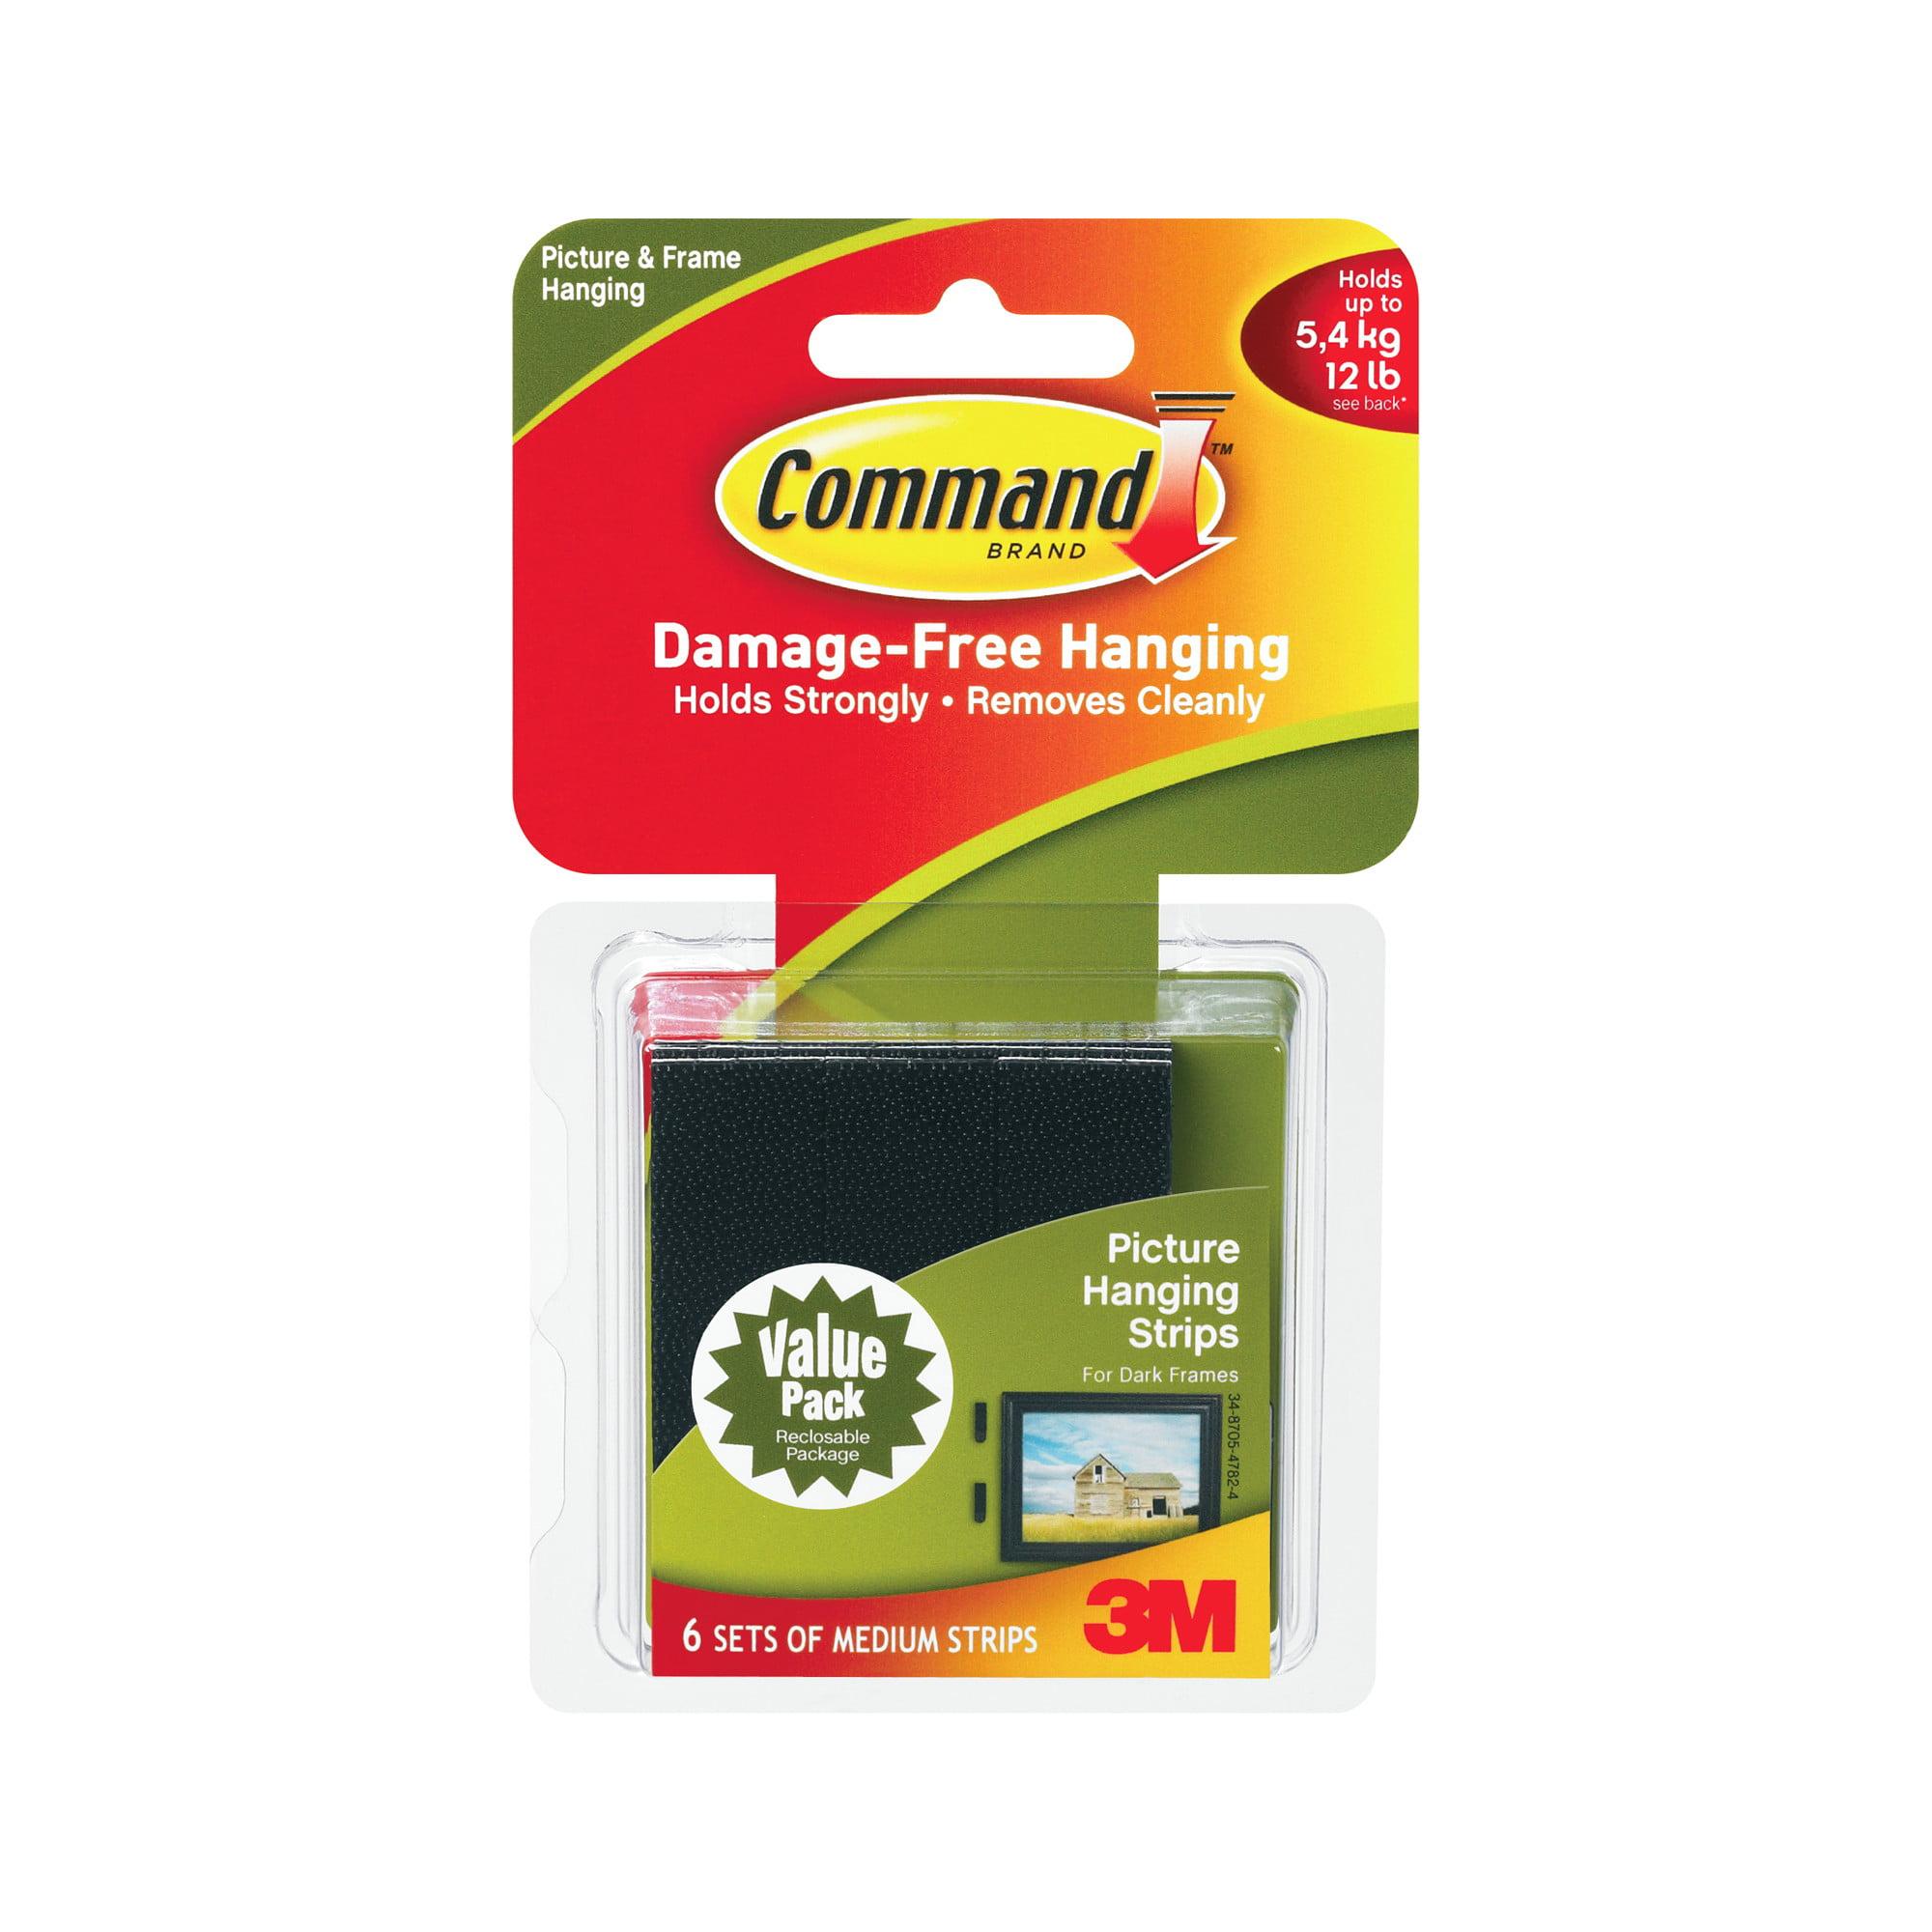 Command Damage-Free Hanging Medium Picture Hanging Strips - 6 PRS, 6.0 PR